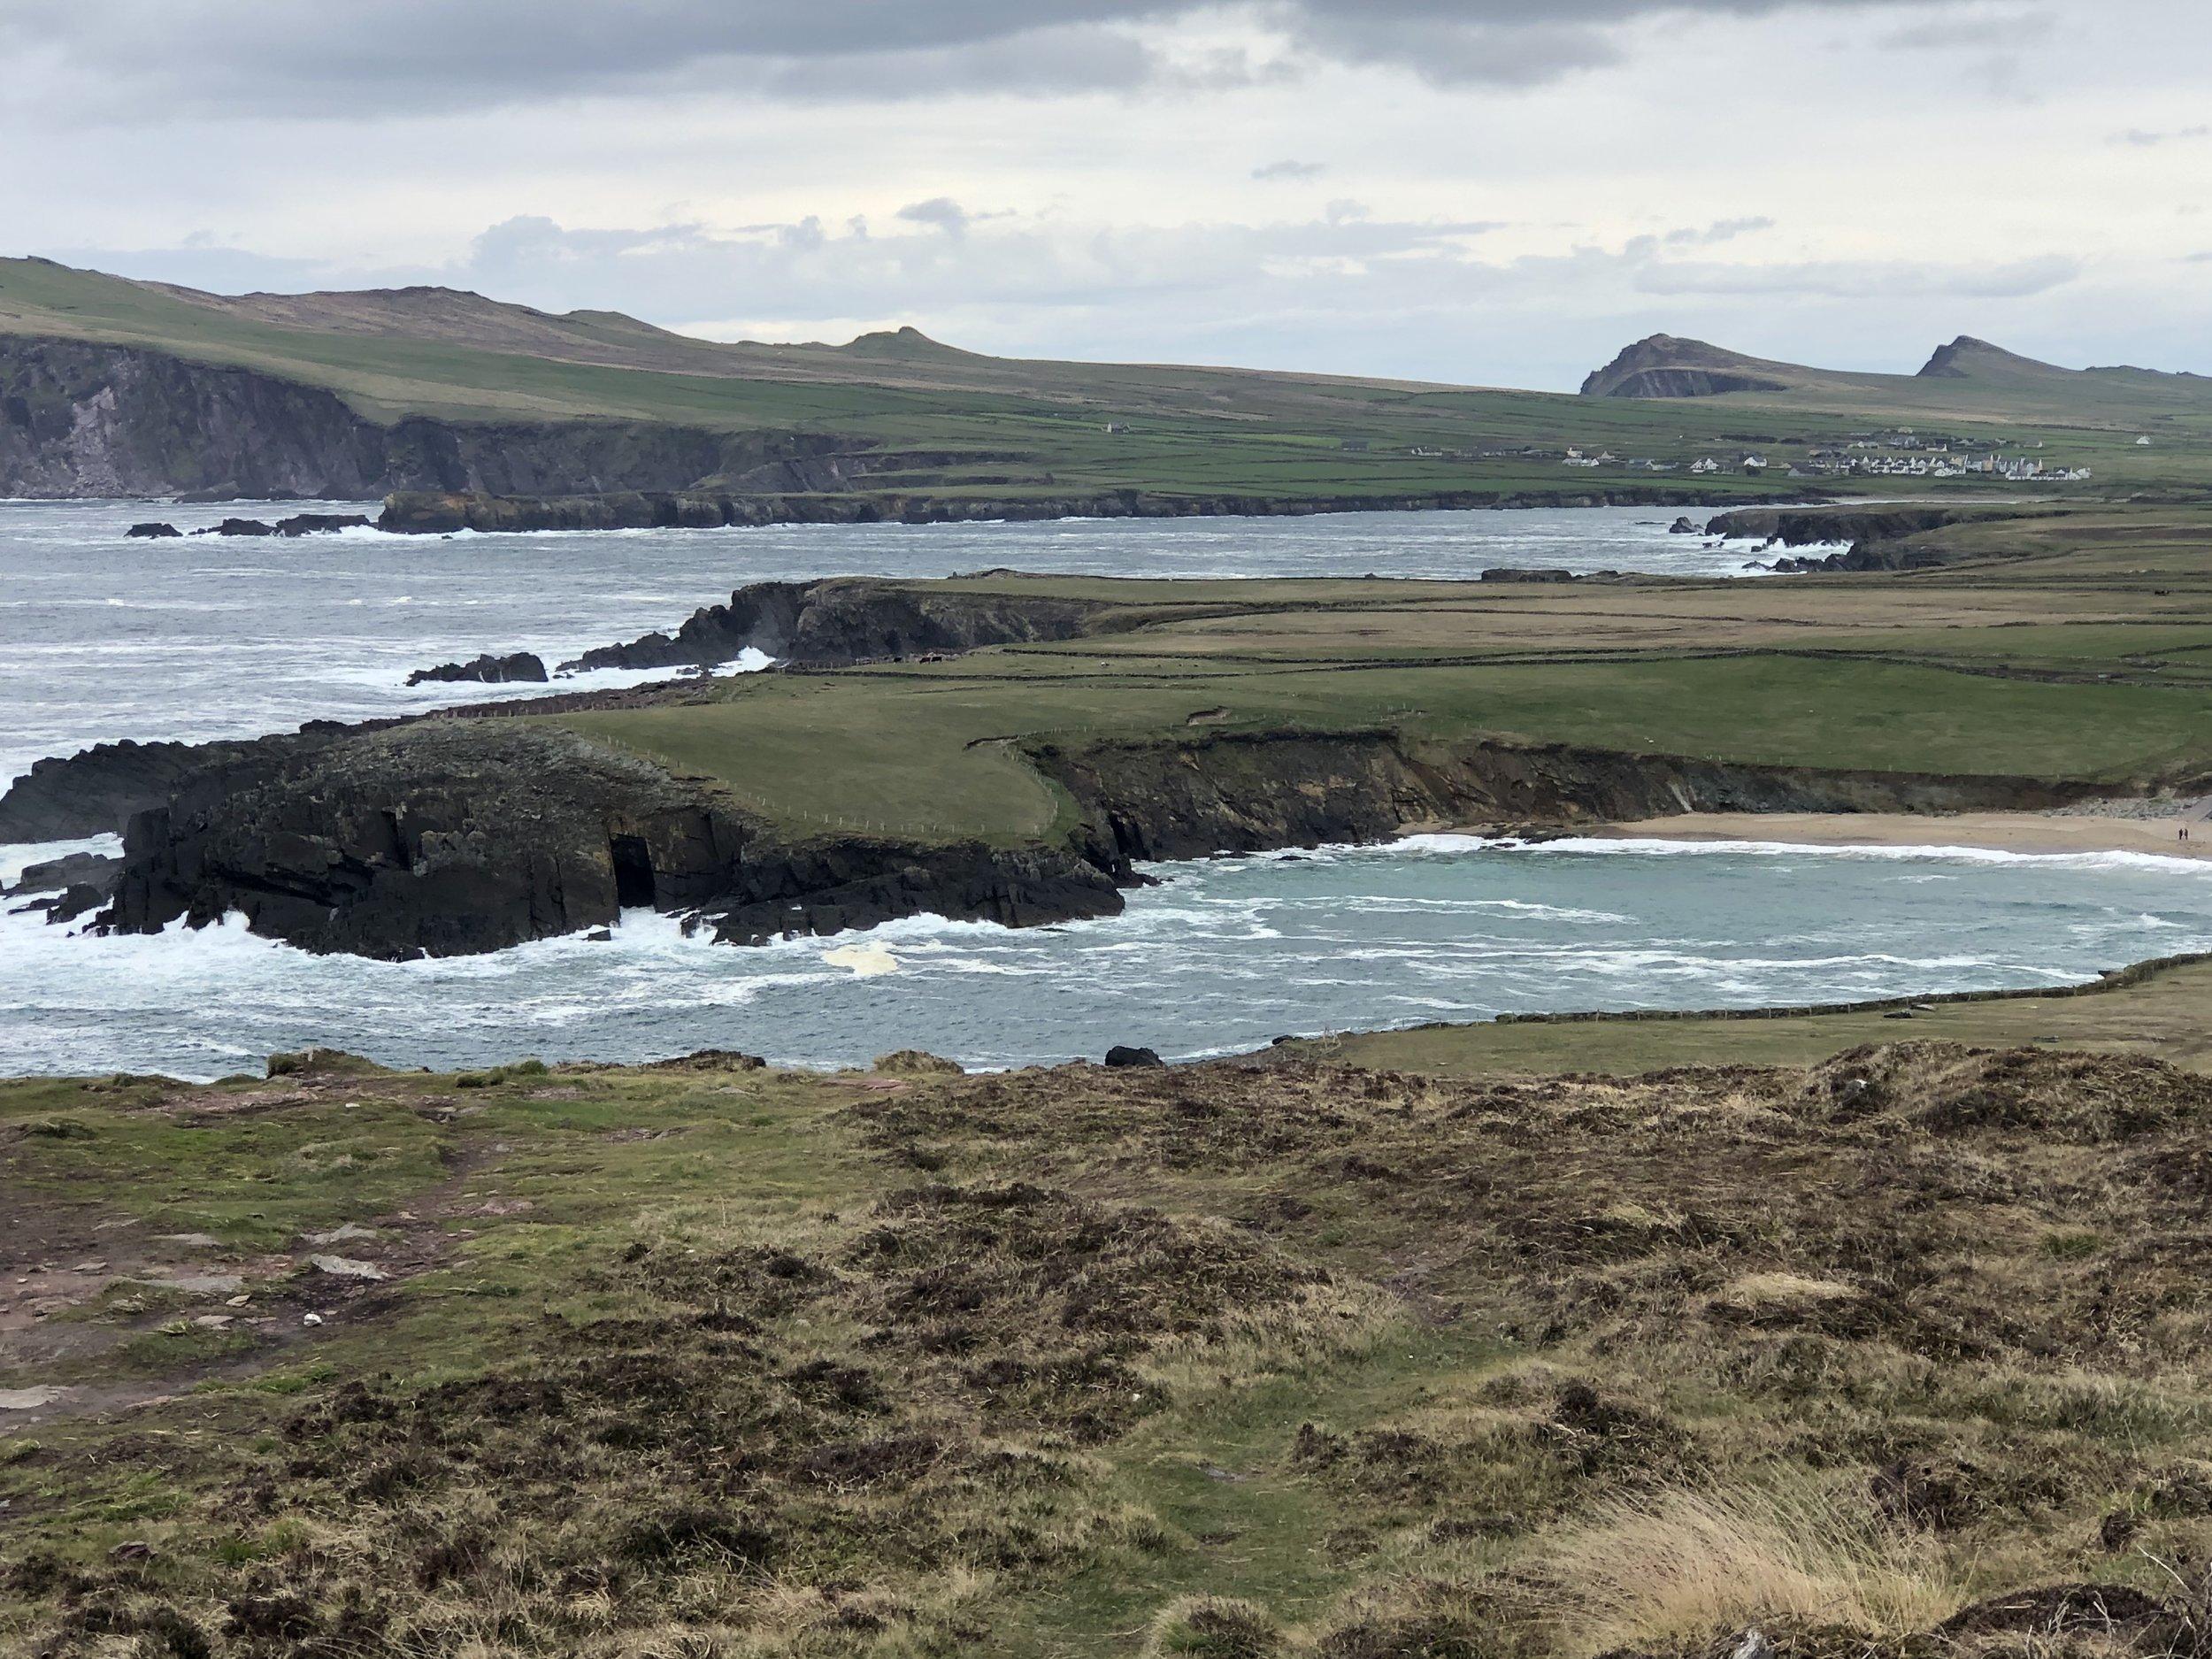 Wanderlust-Travel-blog-small-group-travel-slea-head-ireland